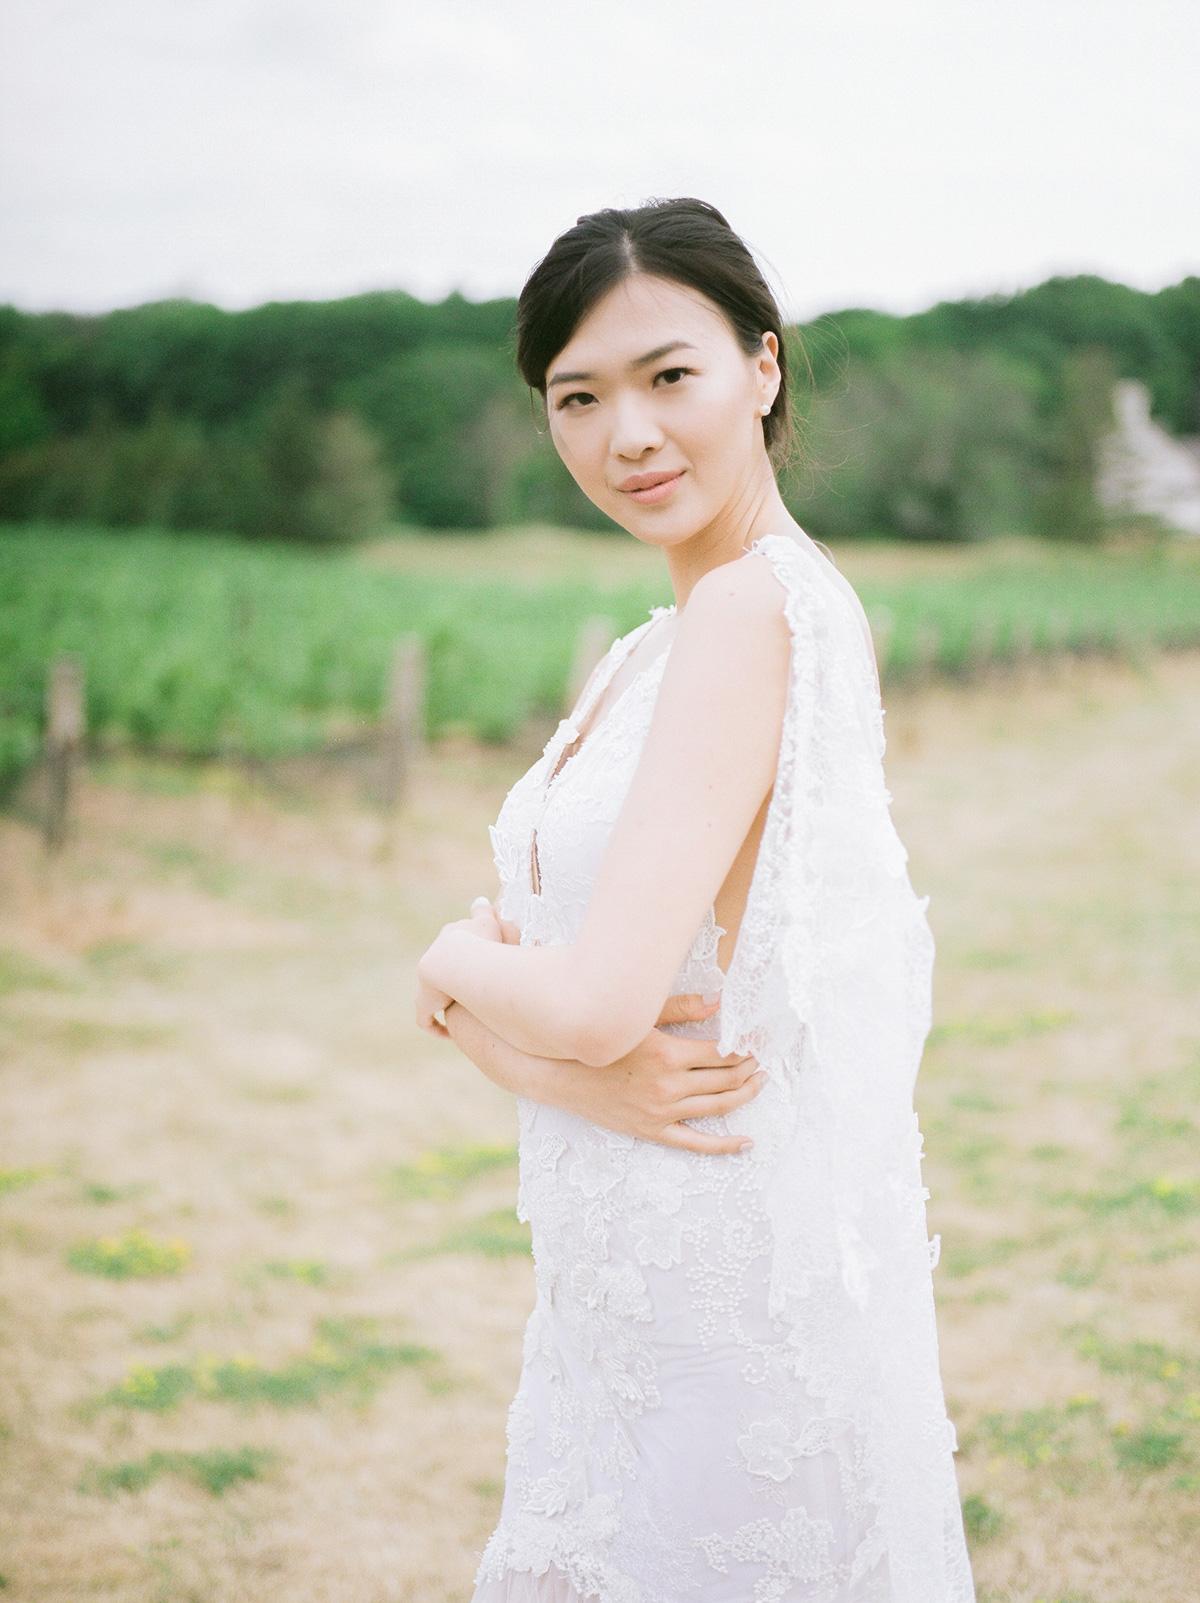 jennifer-xu-photography-vineyard-bride-swish-list-rosewod-eatstes-winery-beamsville-wedding-editorial-5.jpg